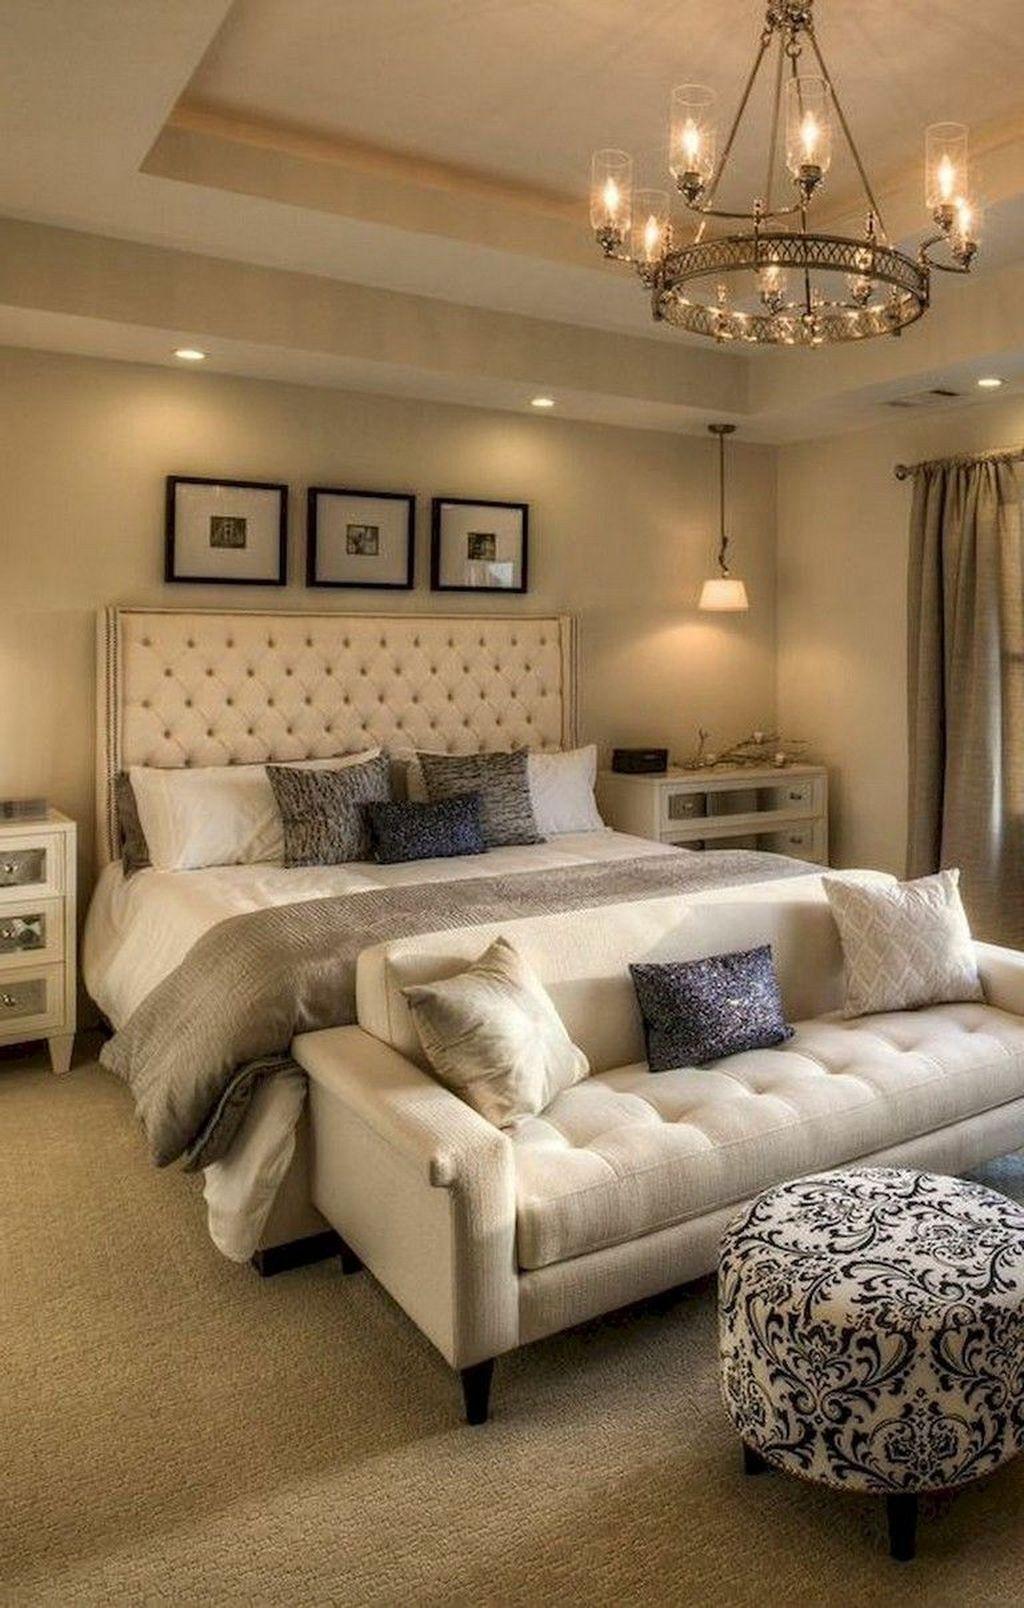 50 Perfect Elegant Bedroom Design Ideas - Trendehouse ...